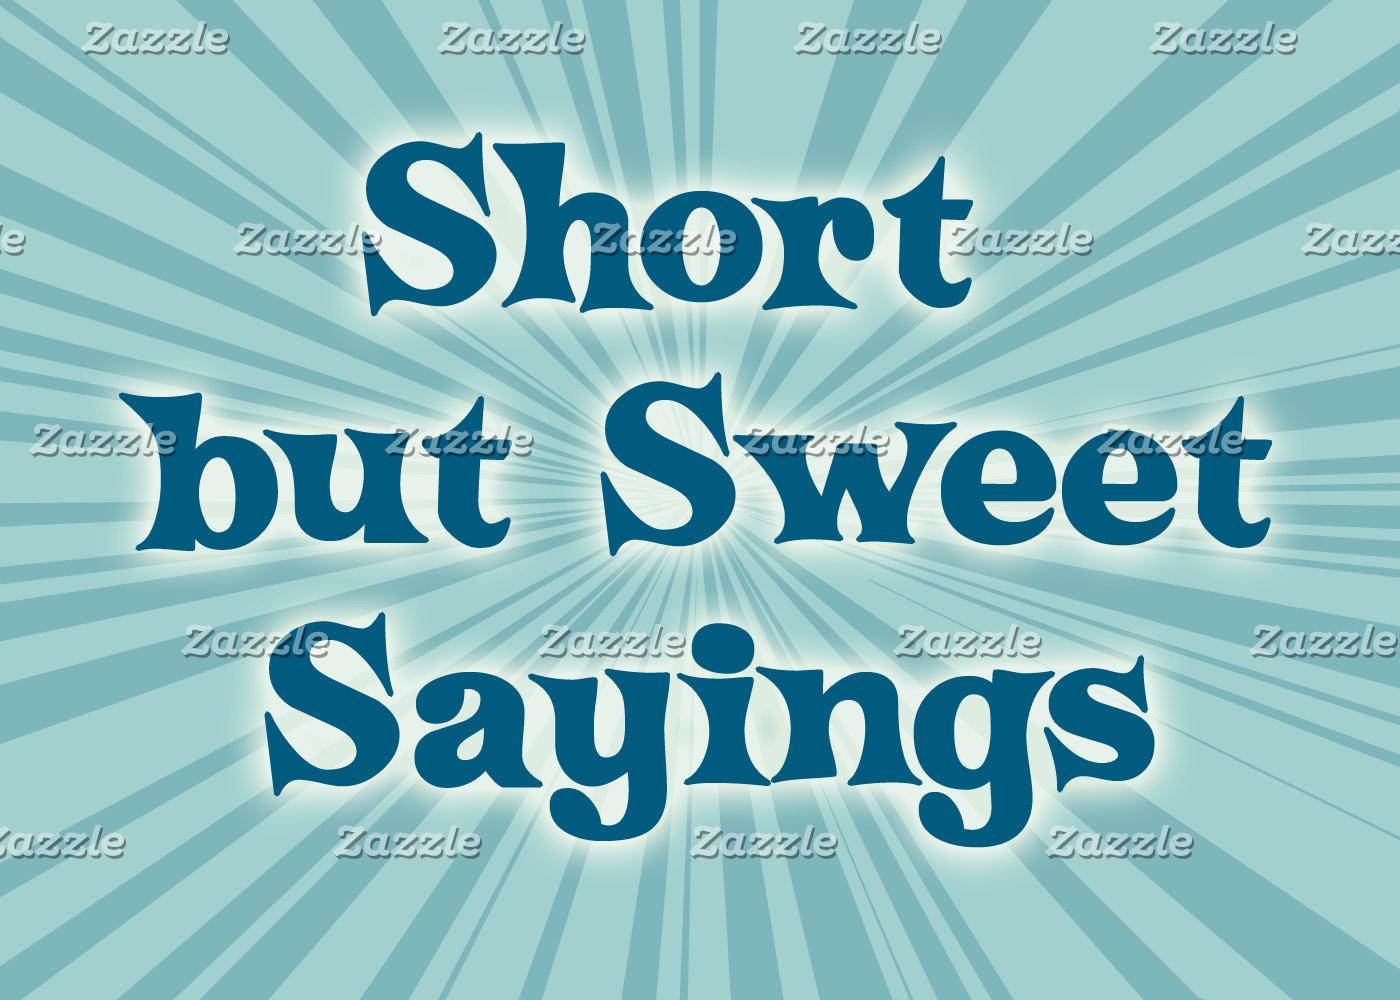 Short but Sweet Sayings